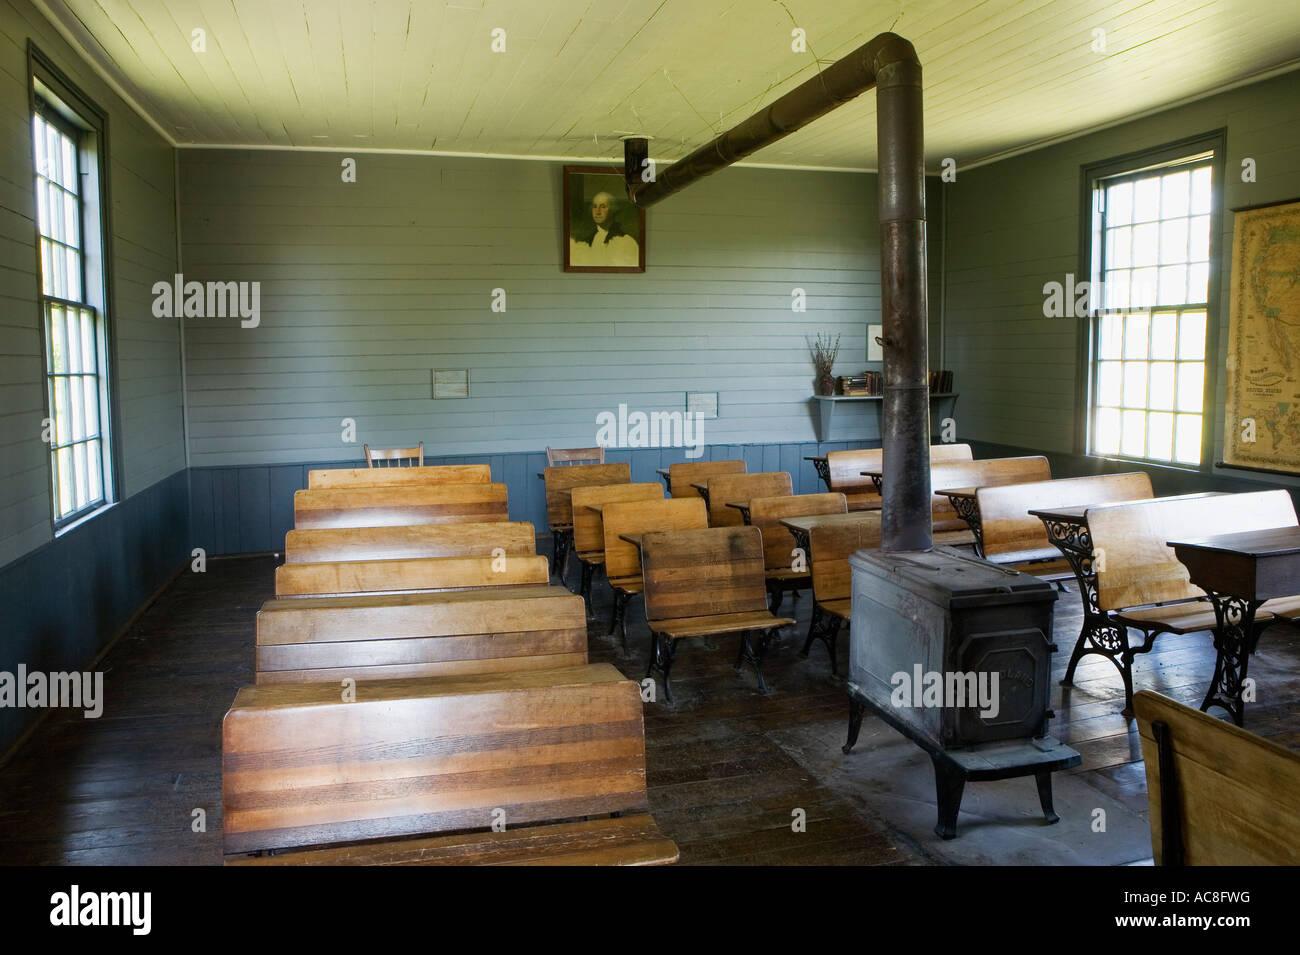 One Room Schoolhouse Erie Canal Village Rome New York Oneida County